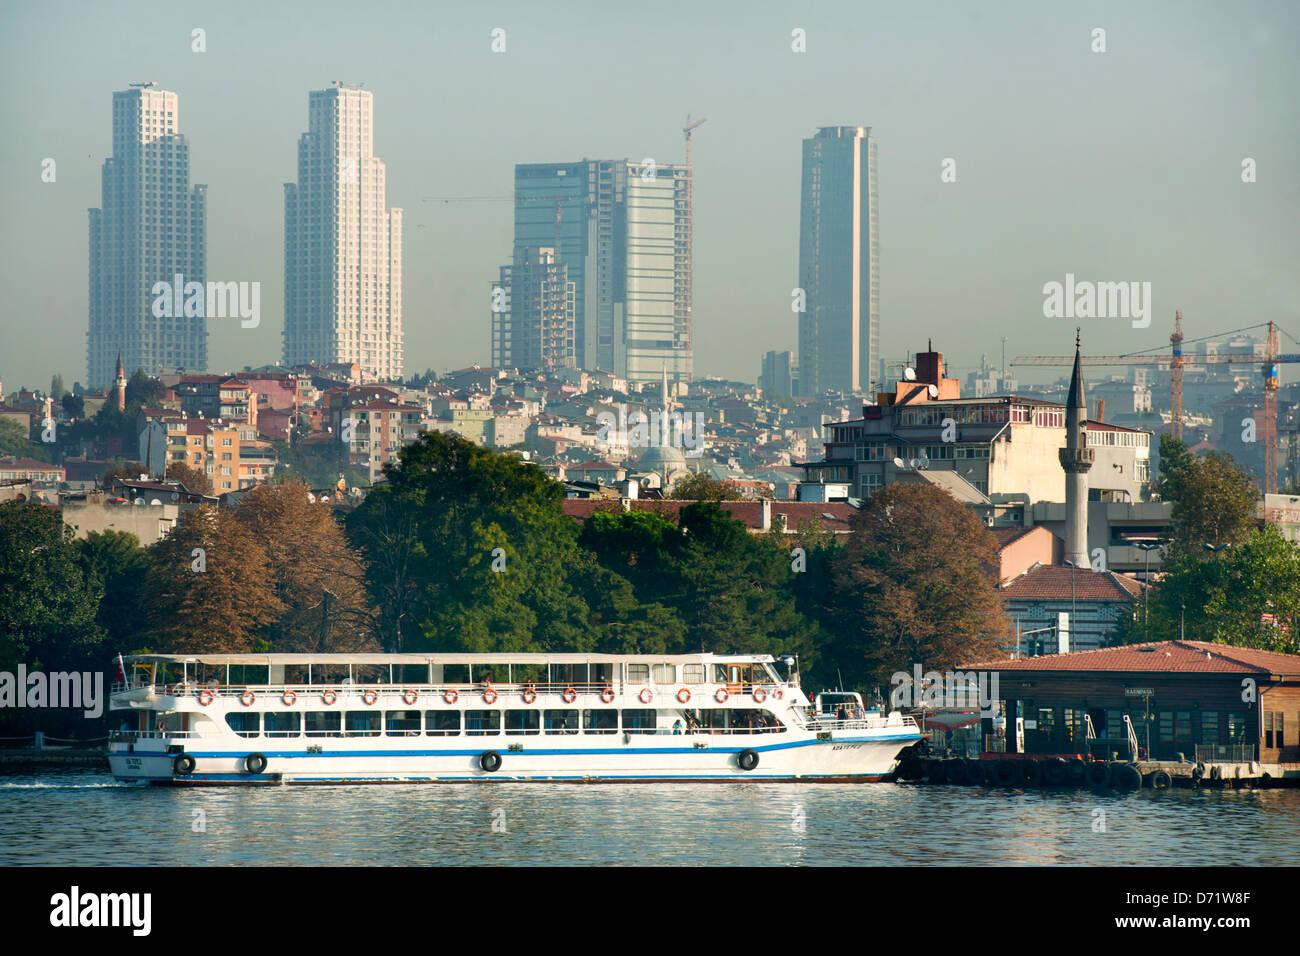 Türkei, Istanbul, Blick vom Goldenen Horn zu den Hochhaustürmen der Anthill Residenz (links), - Stock Image